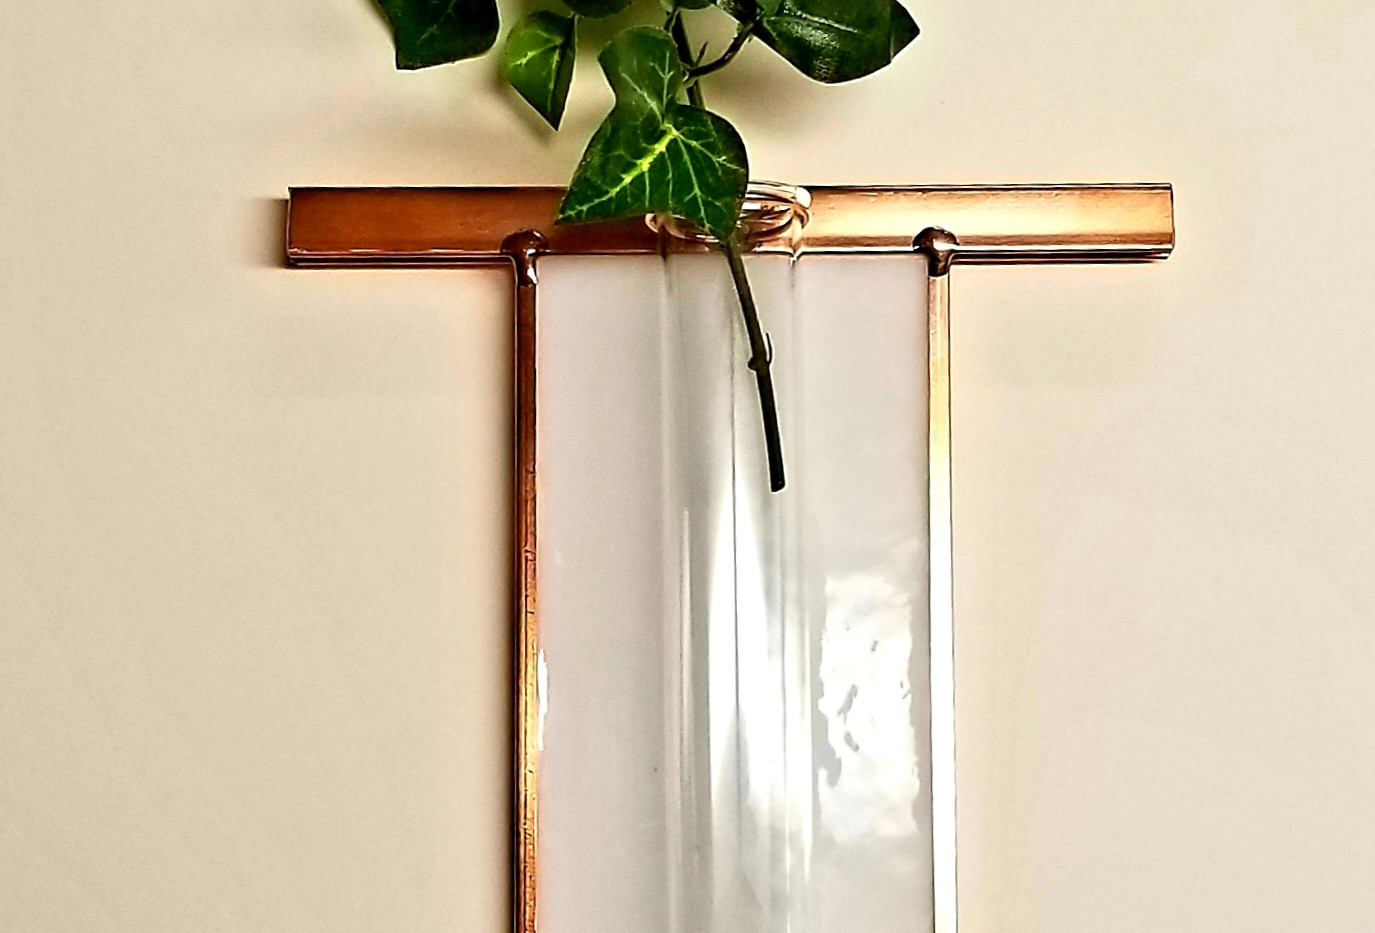 Fused Glass and Copper Roycroft Rose Hanging Bud Vase